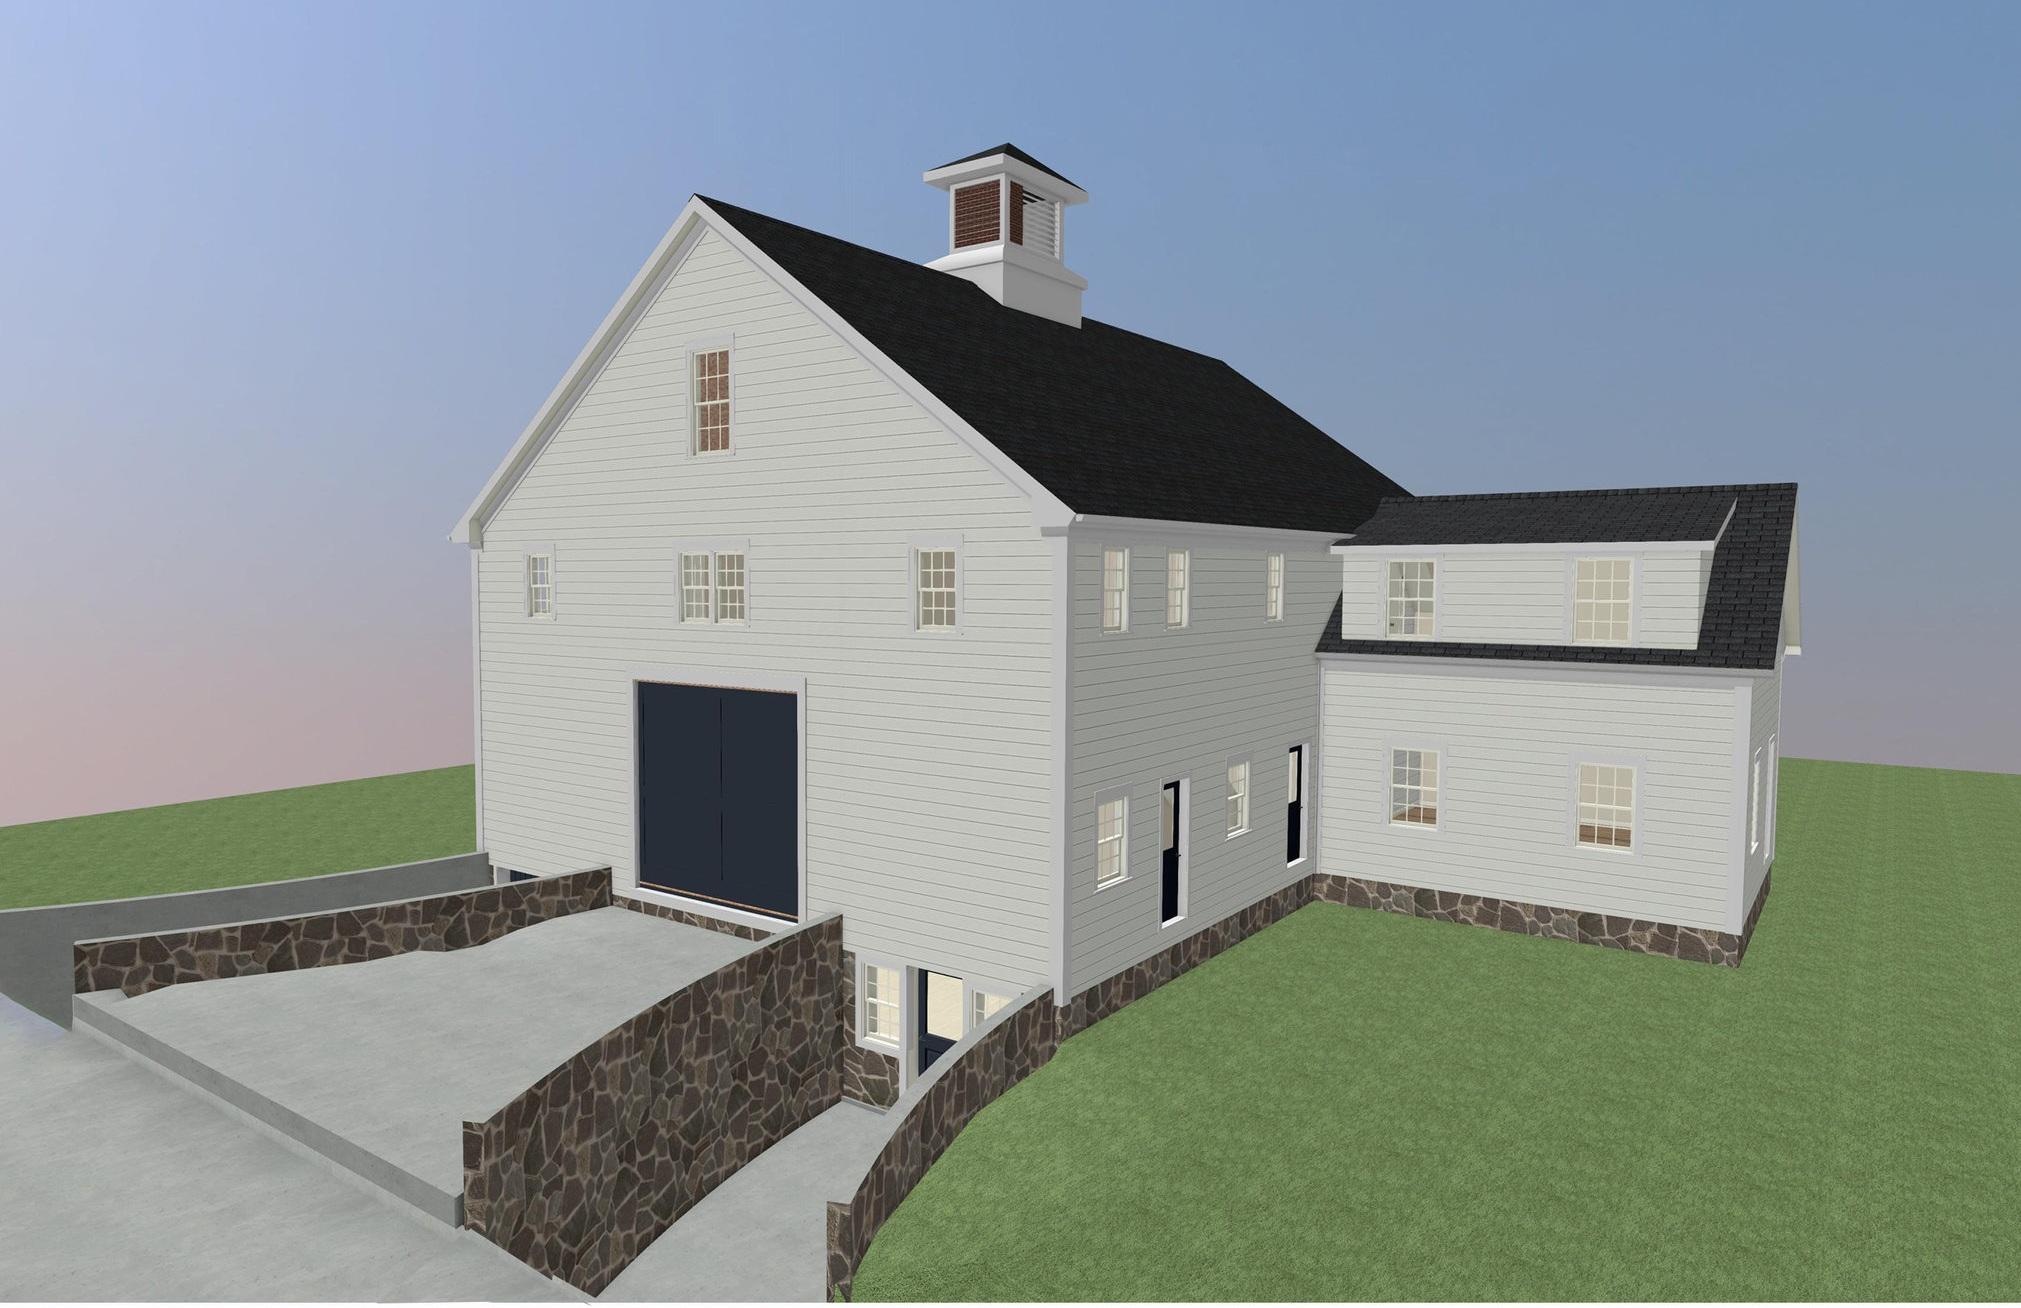 Barn House_EC_Image 2.jpg